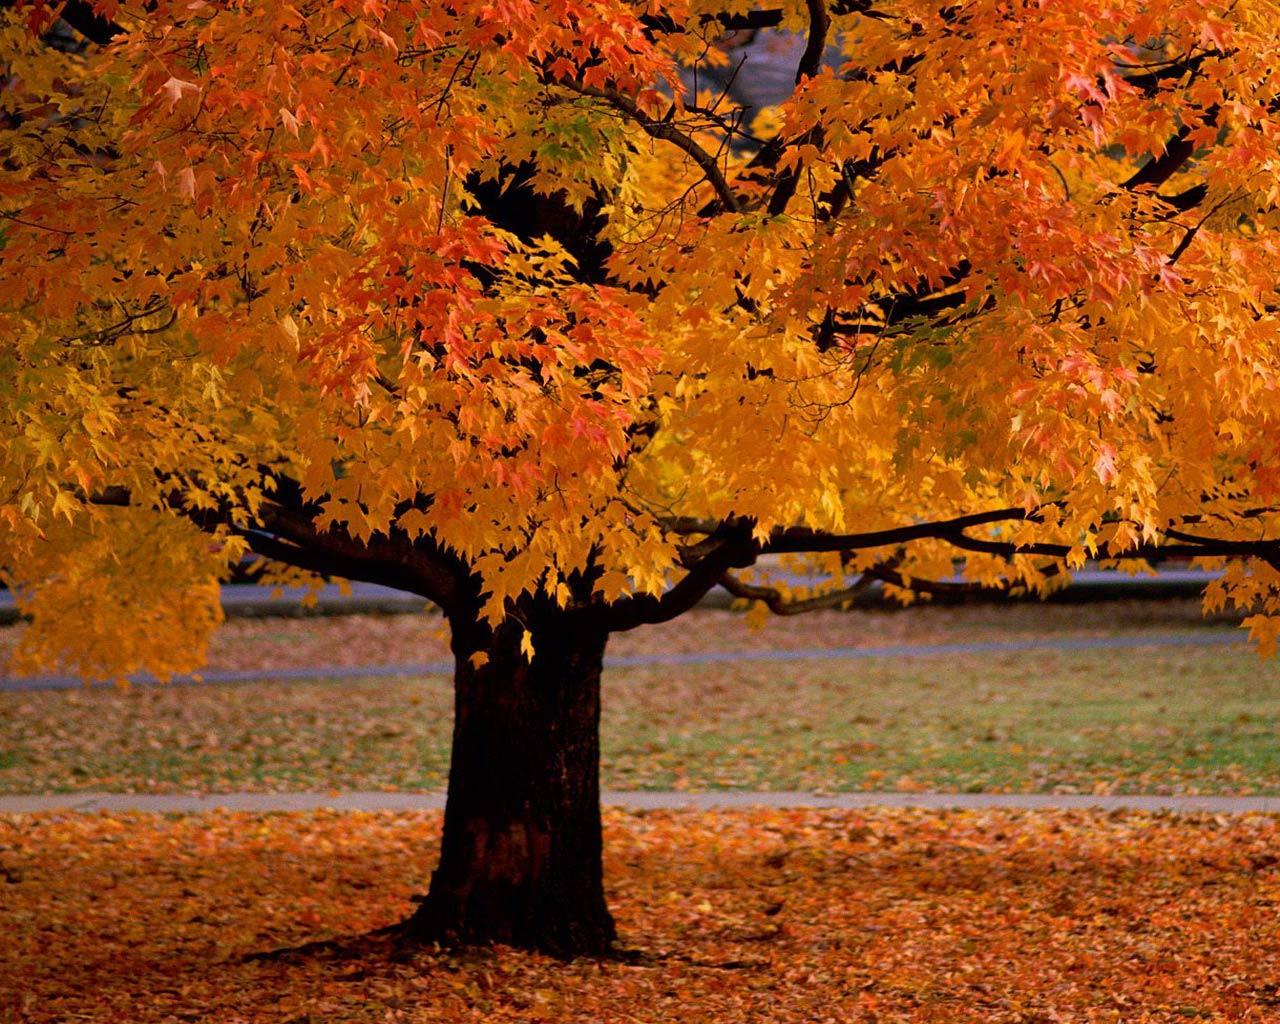 http://4.bp.blogspot.com/-EycvZtfNFf8/T9qwg_gZjCI/AAAAAAAAA7U/Y9g8tHyITVs/s1600/Autumn-Wallpaper-7.jpg